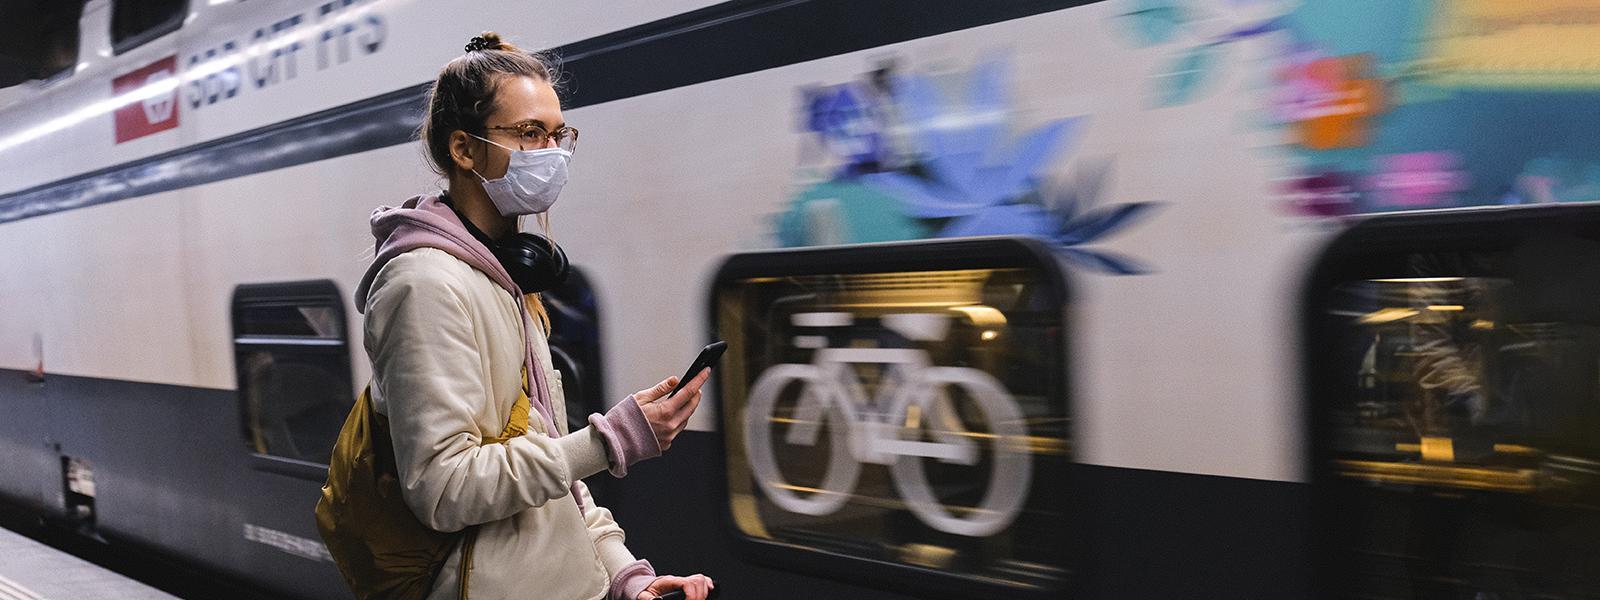 Protective face masks coronavirus on public transport